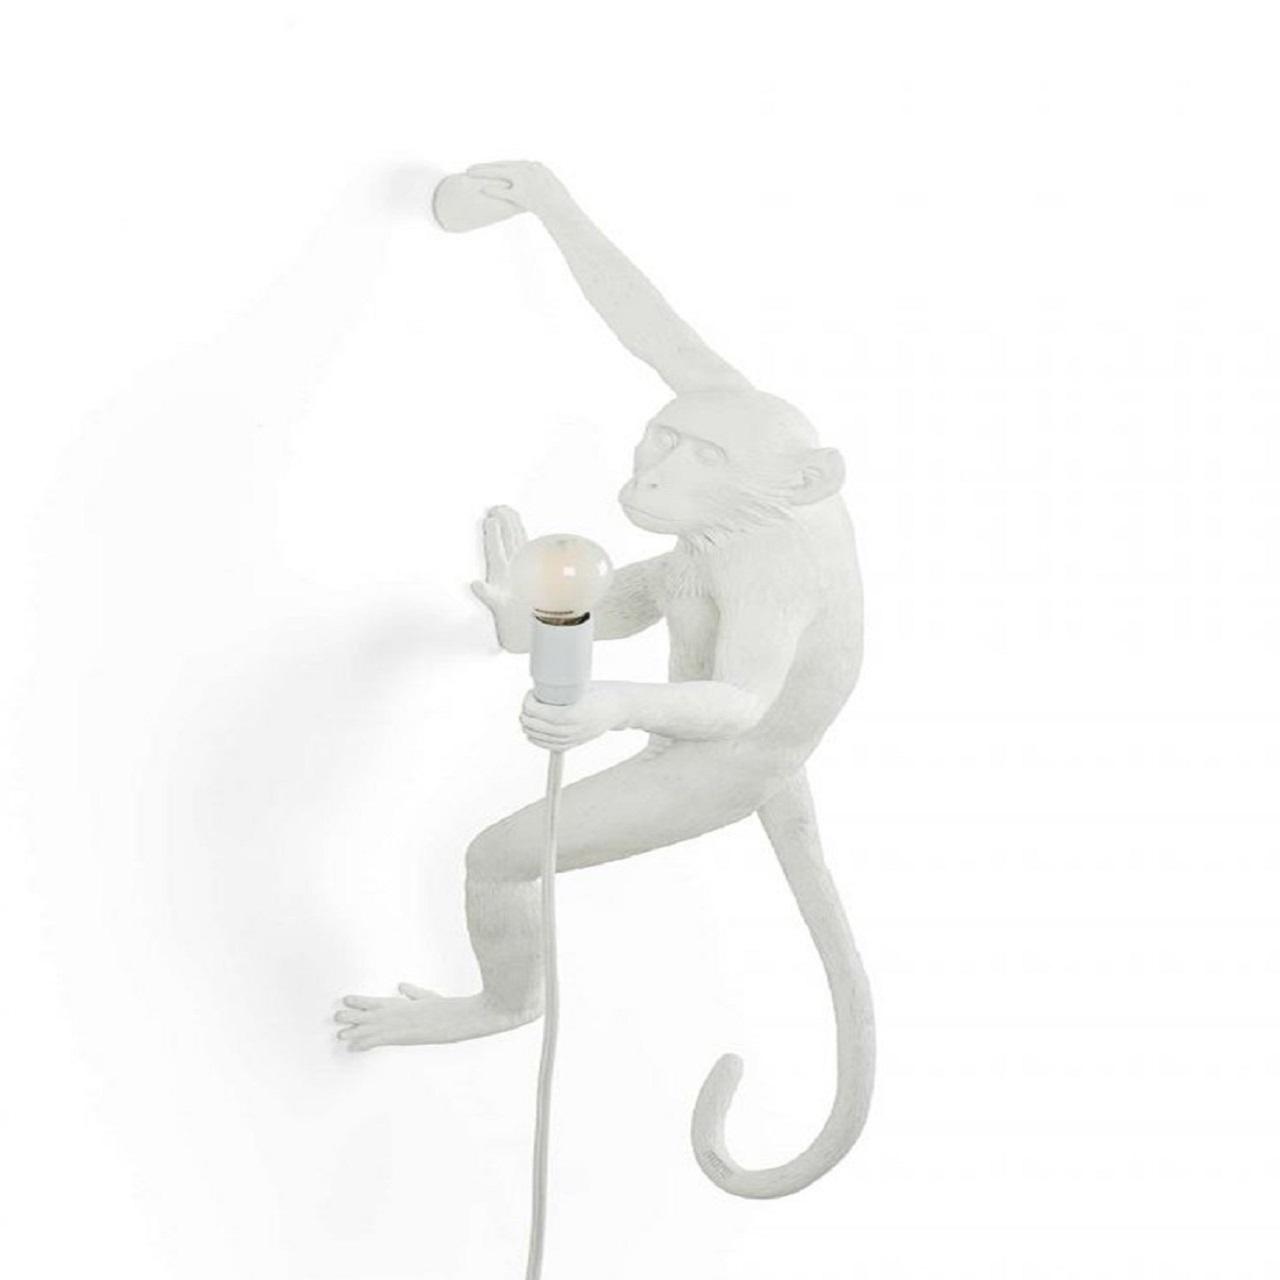 Monkey Lamp pendurado direita   Branco